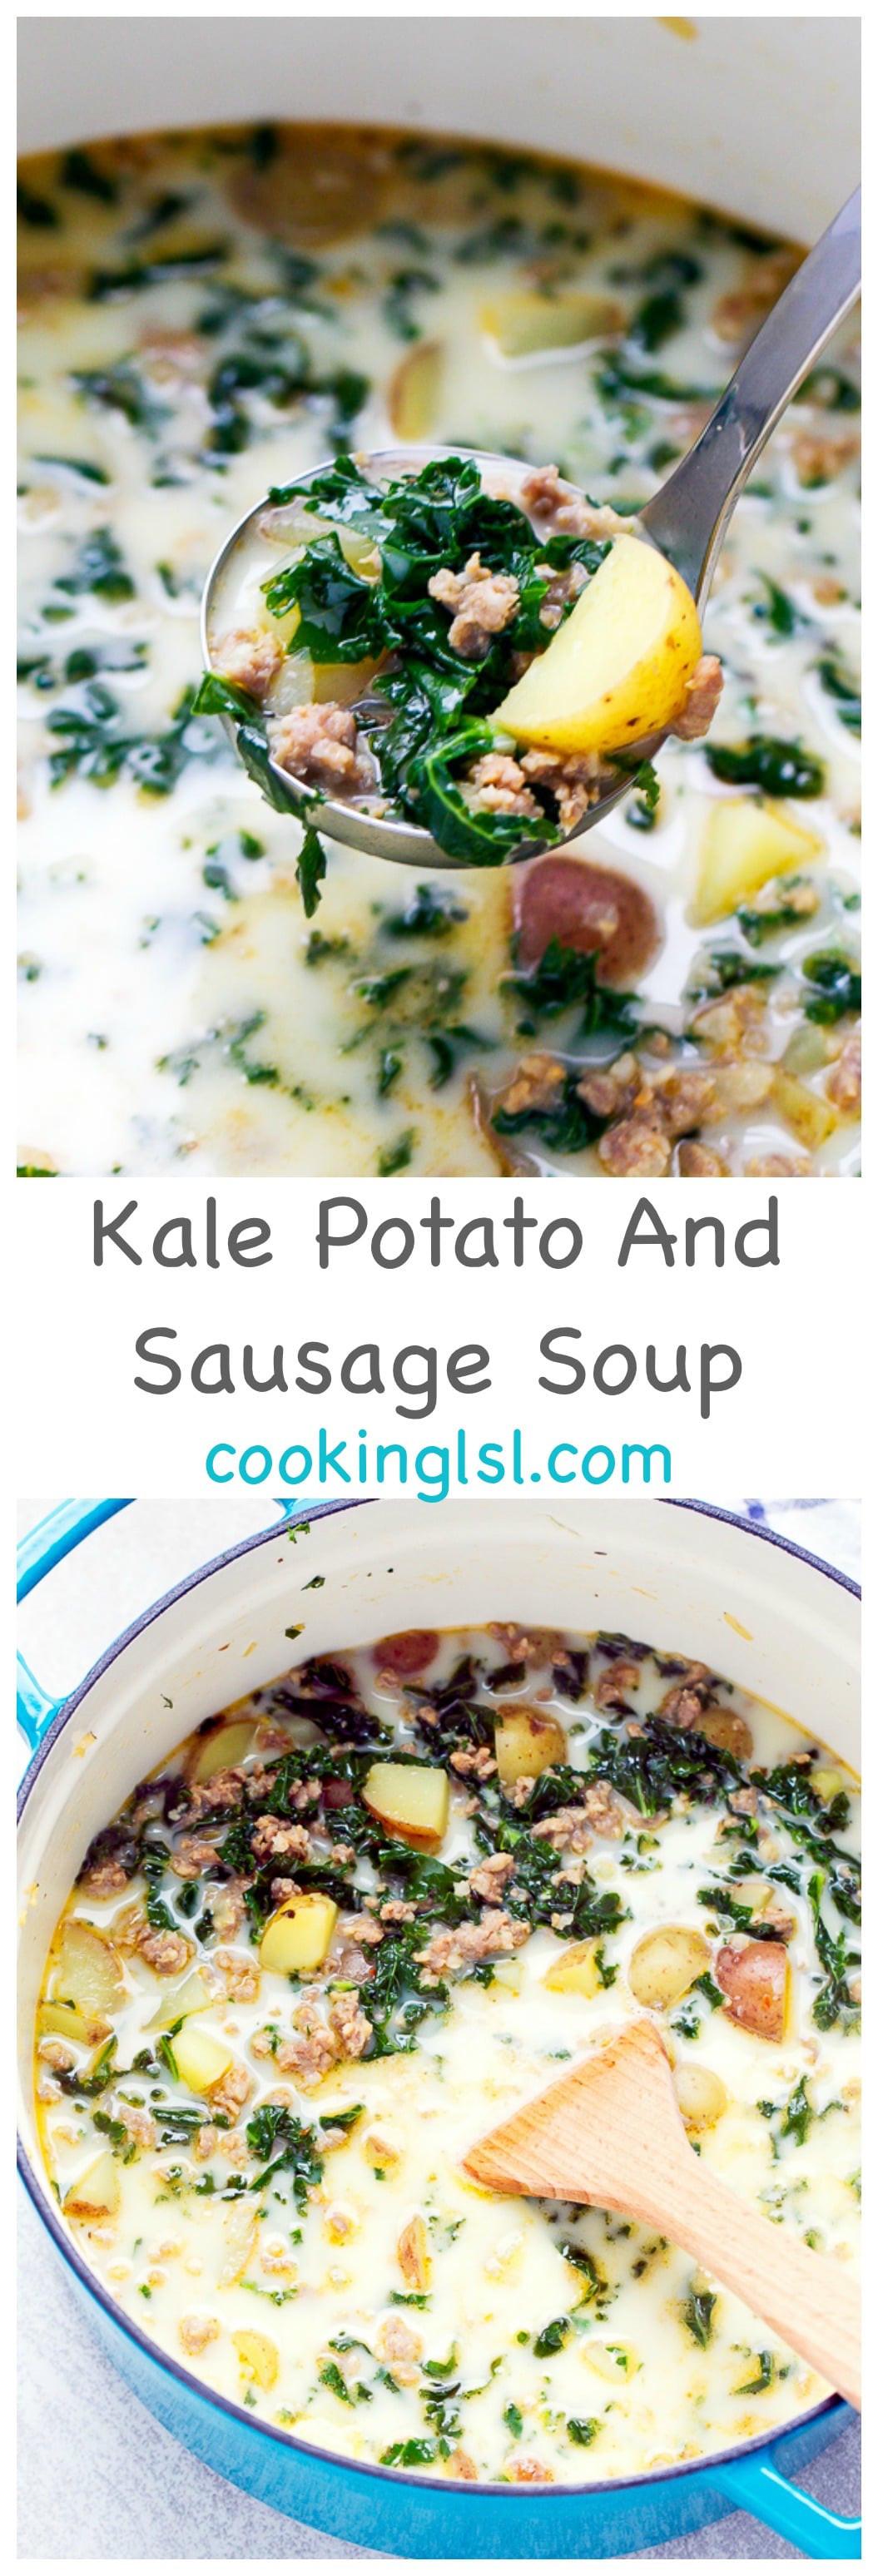 Potato Kale Soup  Easy Kale Potato And Sausage Soup Recipe Cooking LSL